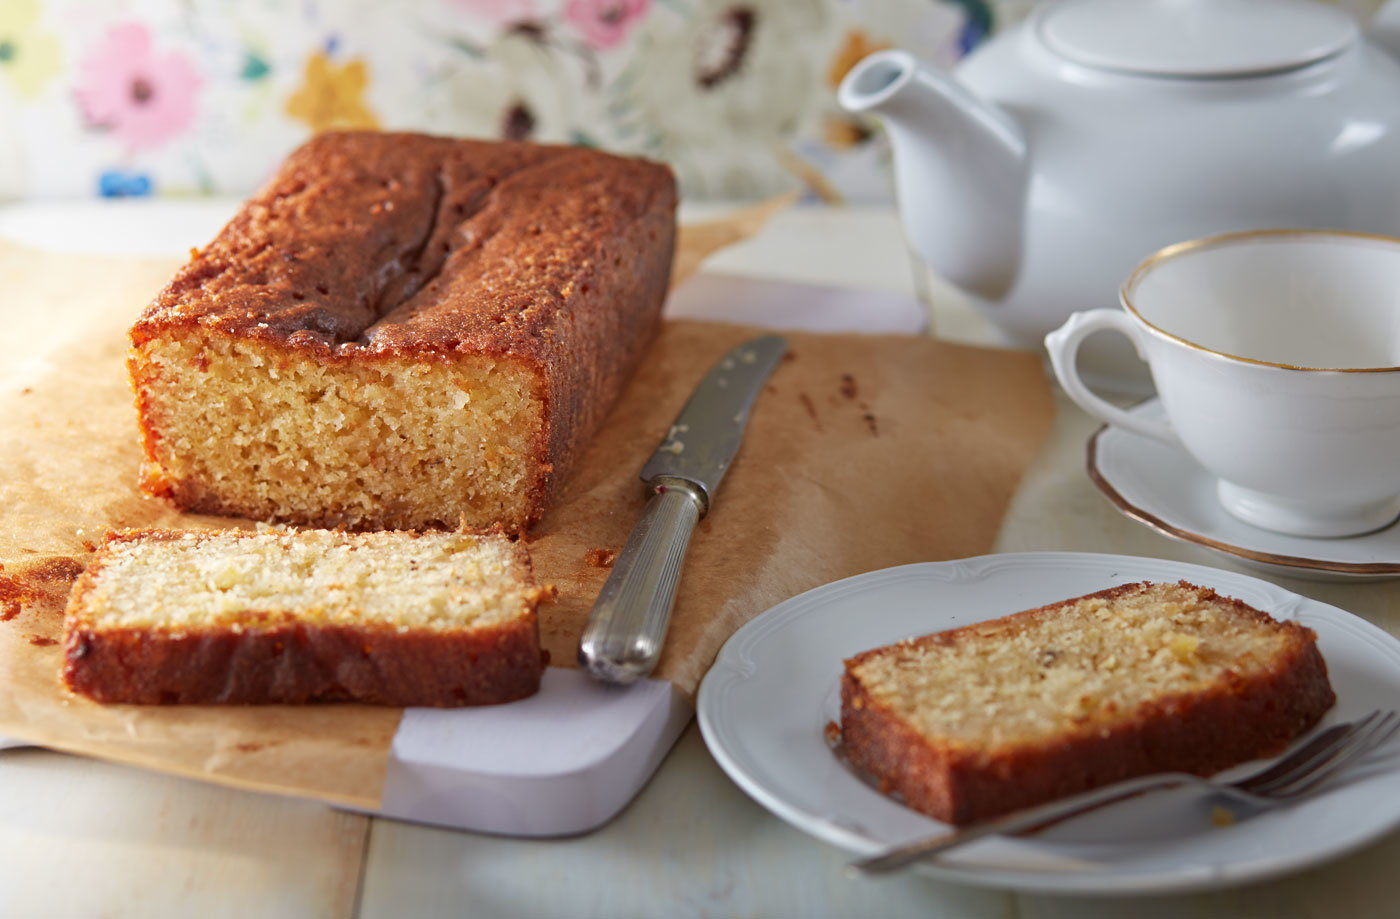 Tesco ginger cake recipe cake recipe cardamom lemon drizzle cake easter cakes tesco real food forumfinder Images